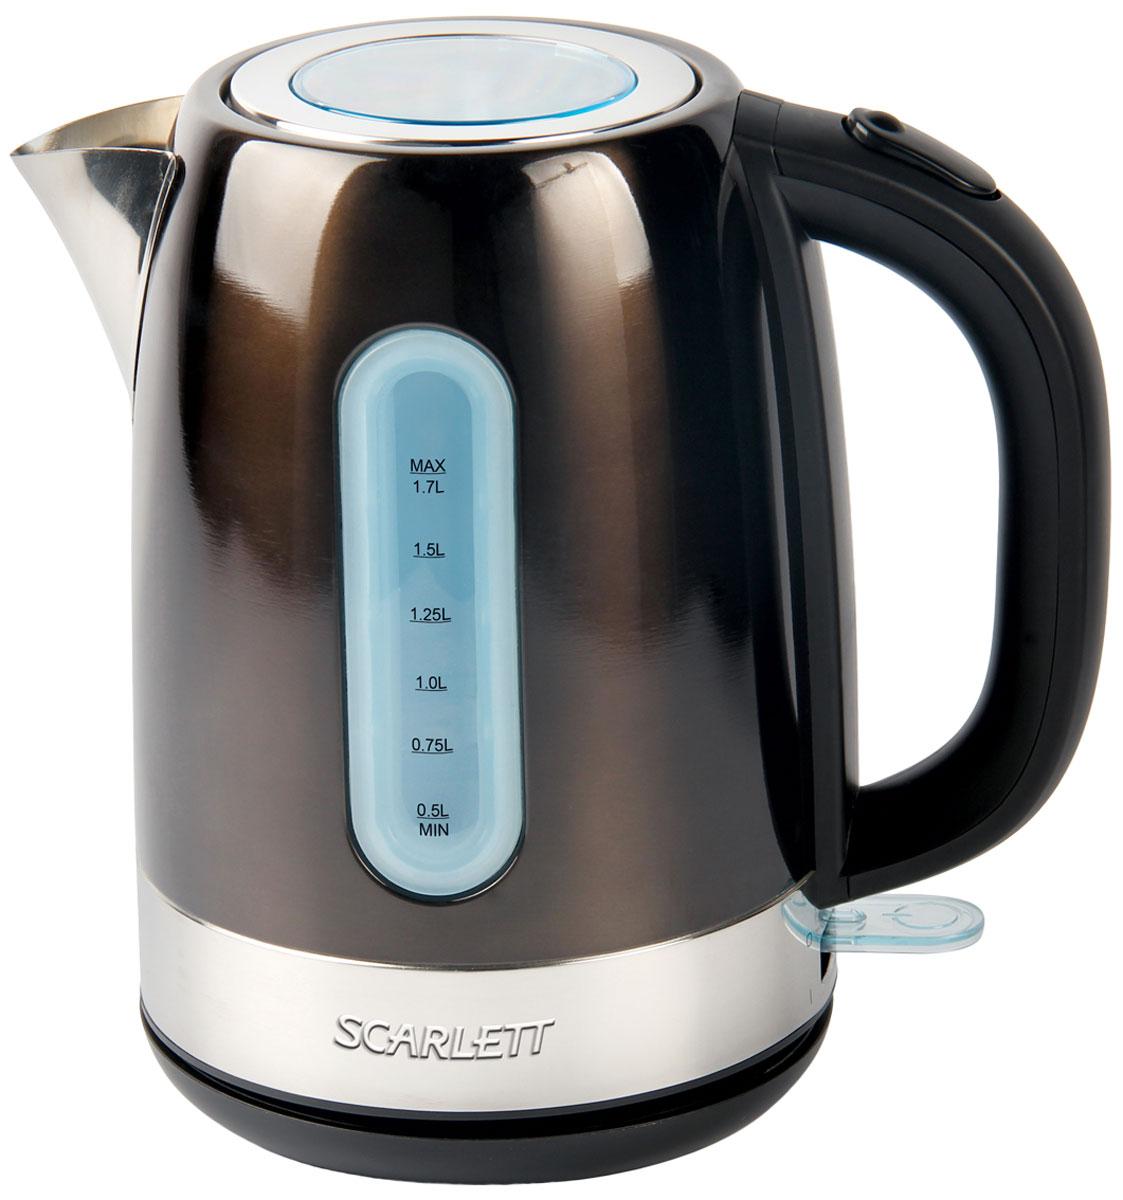 Scarlett SC-EK21S39, Dark Olive электрический чайник обогреватель scarlett sc 21 2009 s2